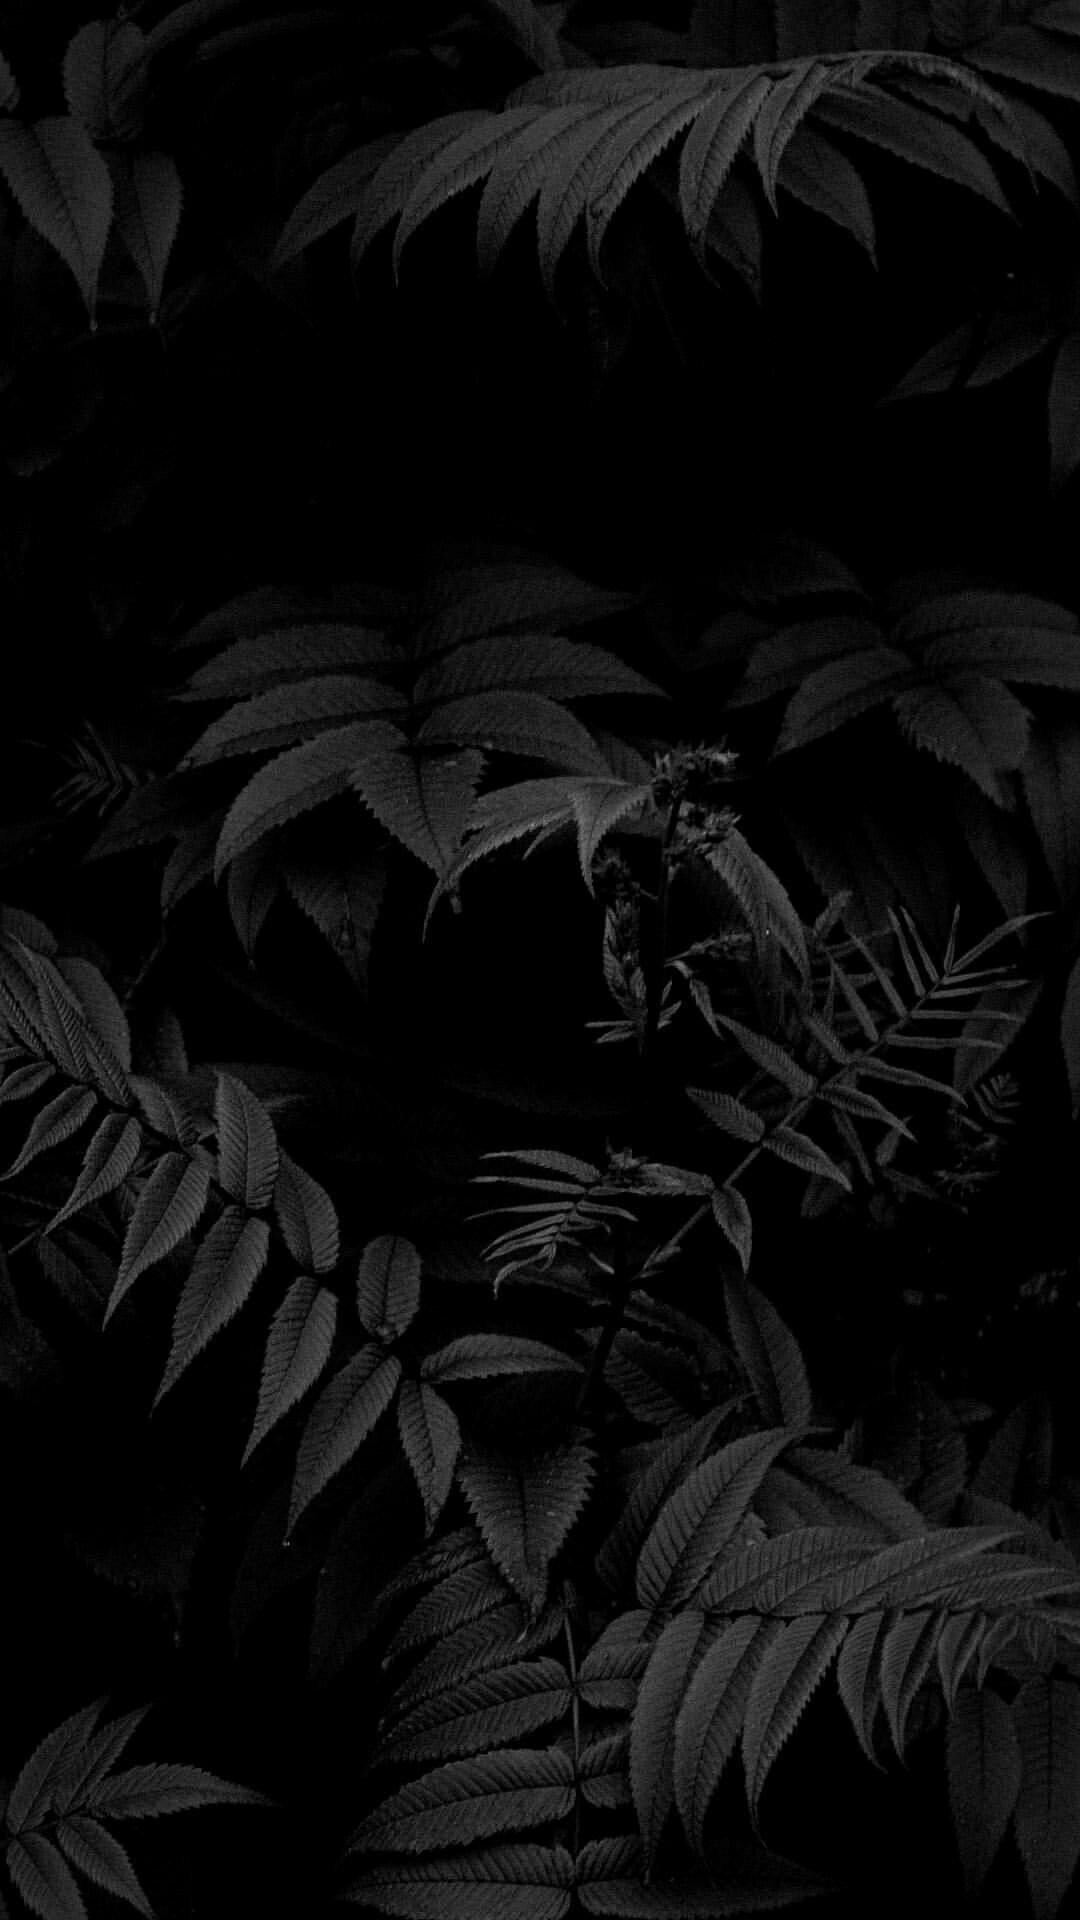 Dark lock screen wallpaper